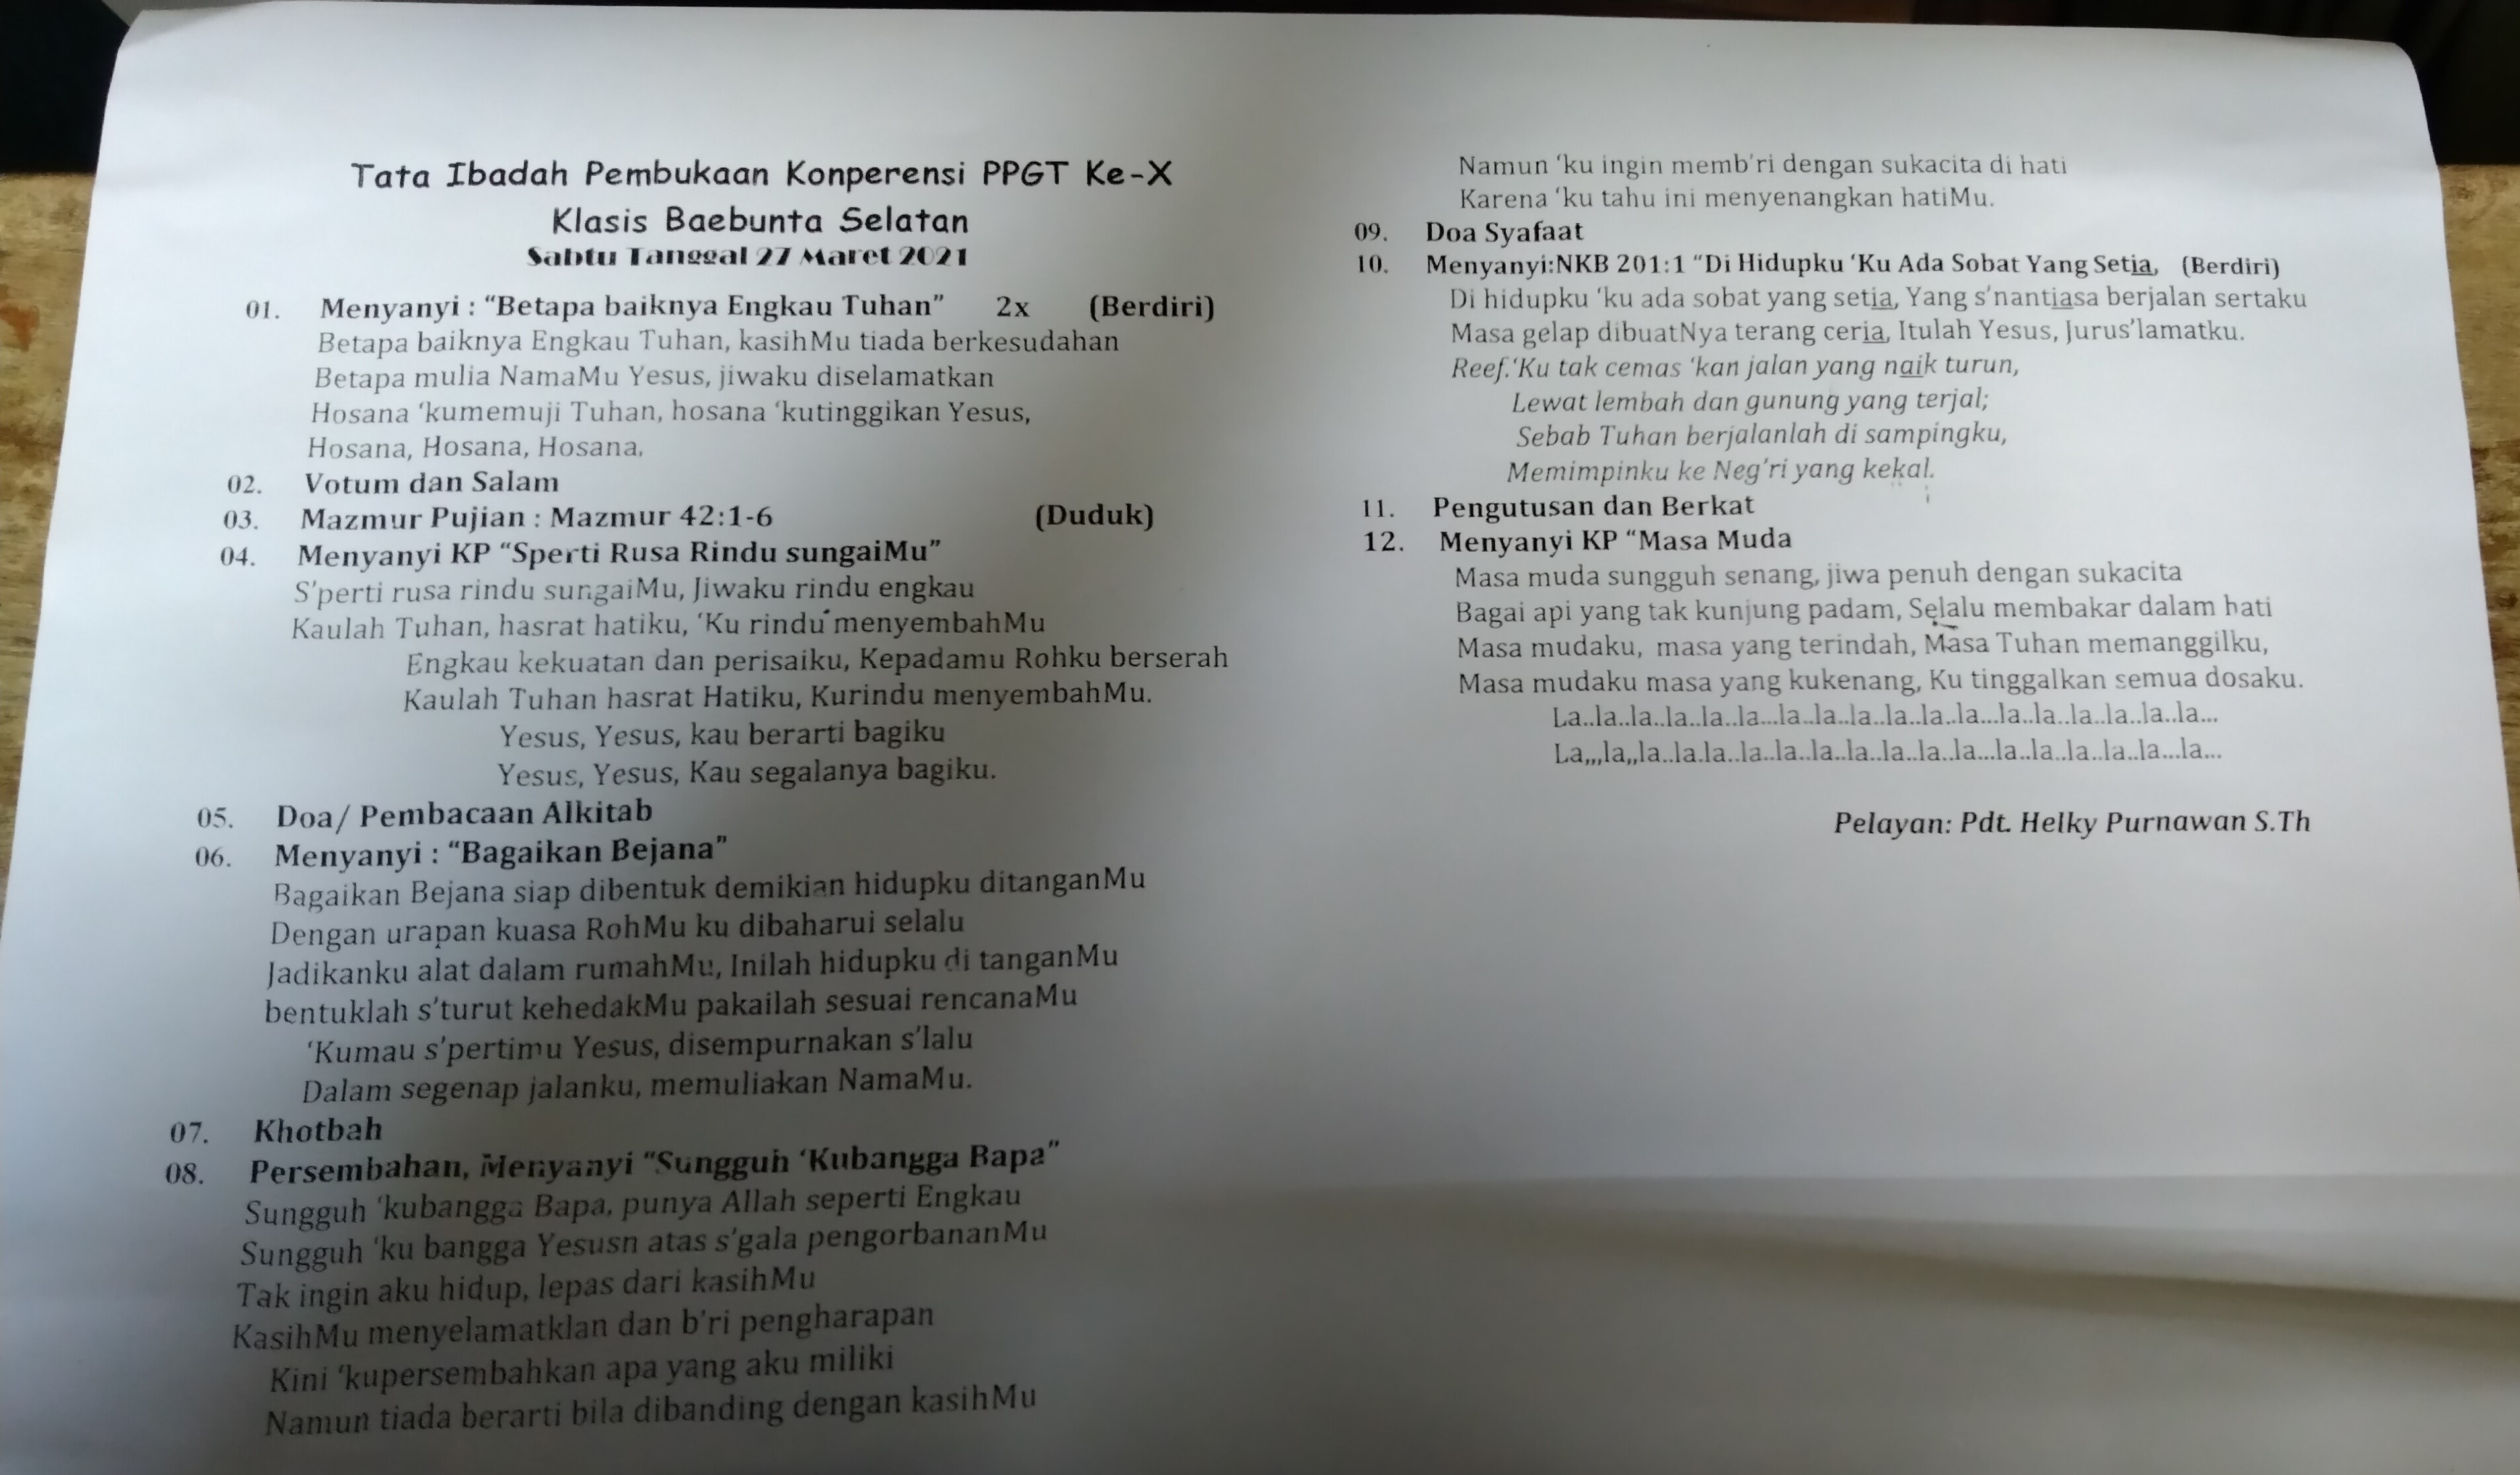 Contoh liturgi ibadah konperensi PPGT Klasis